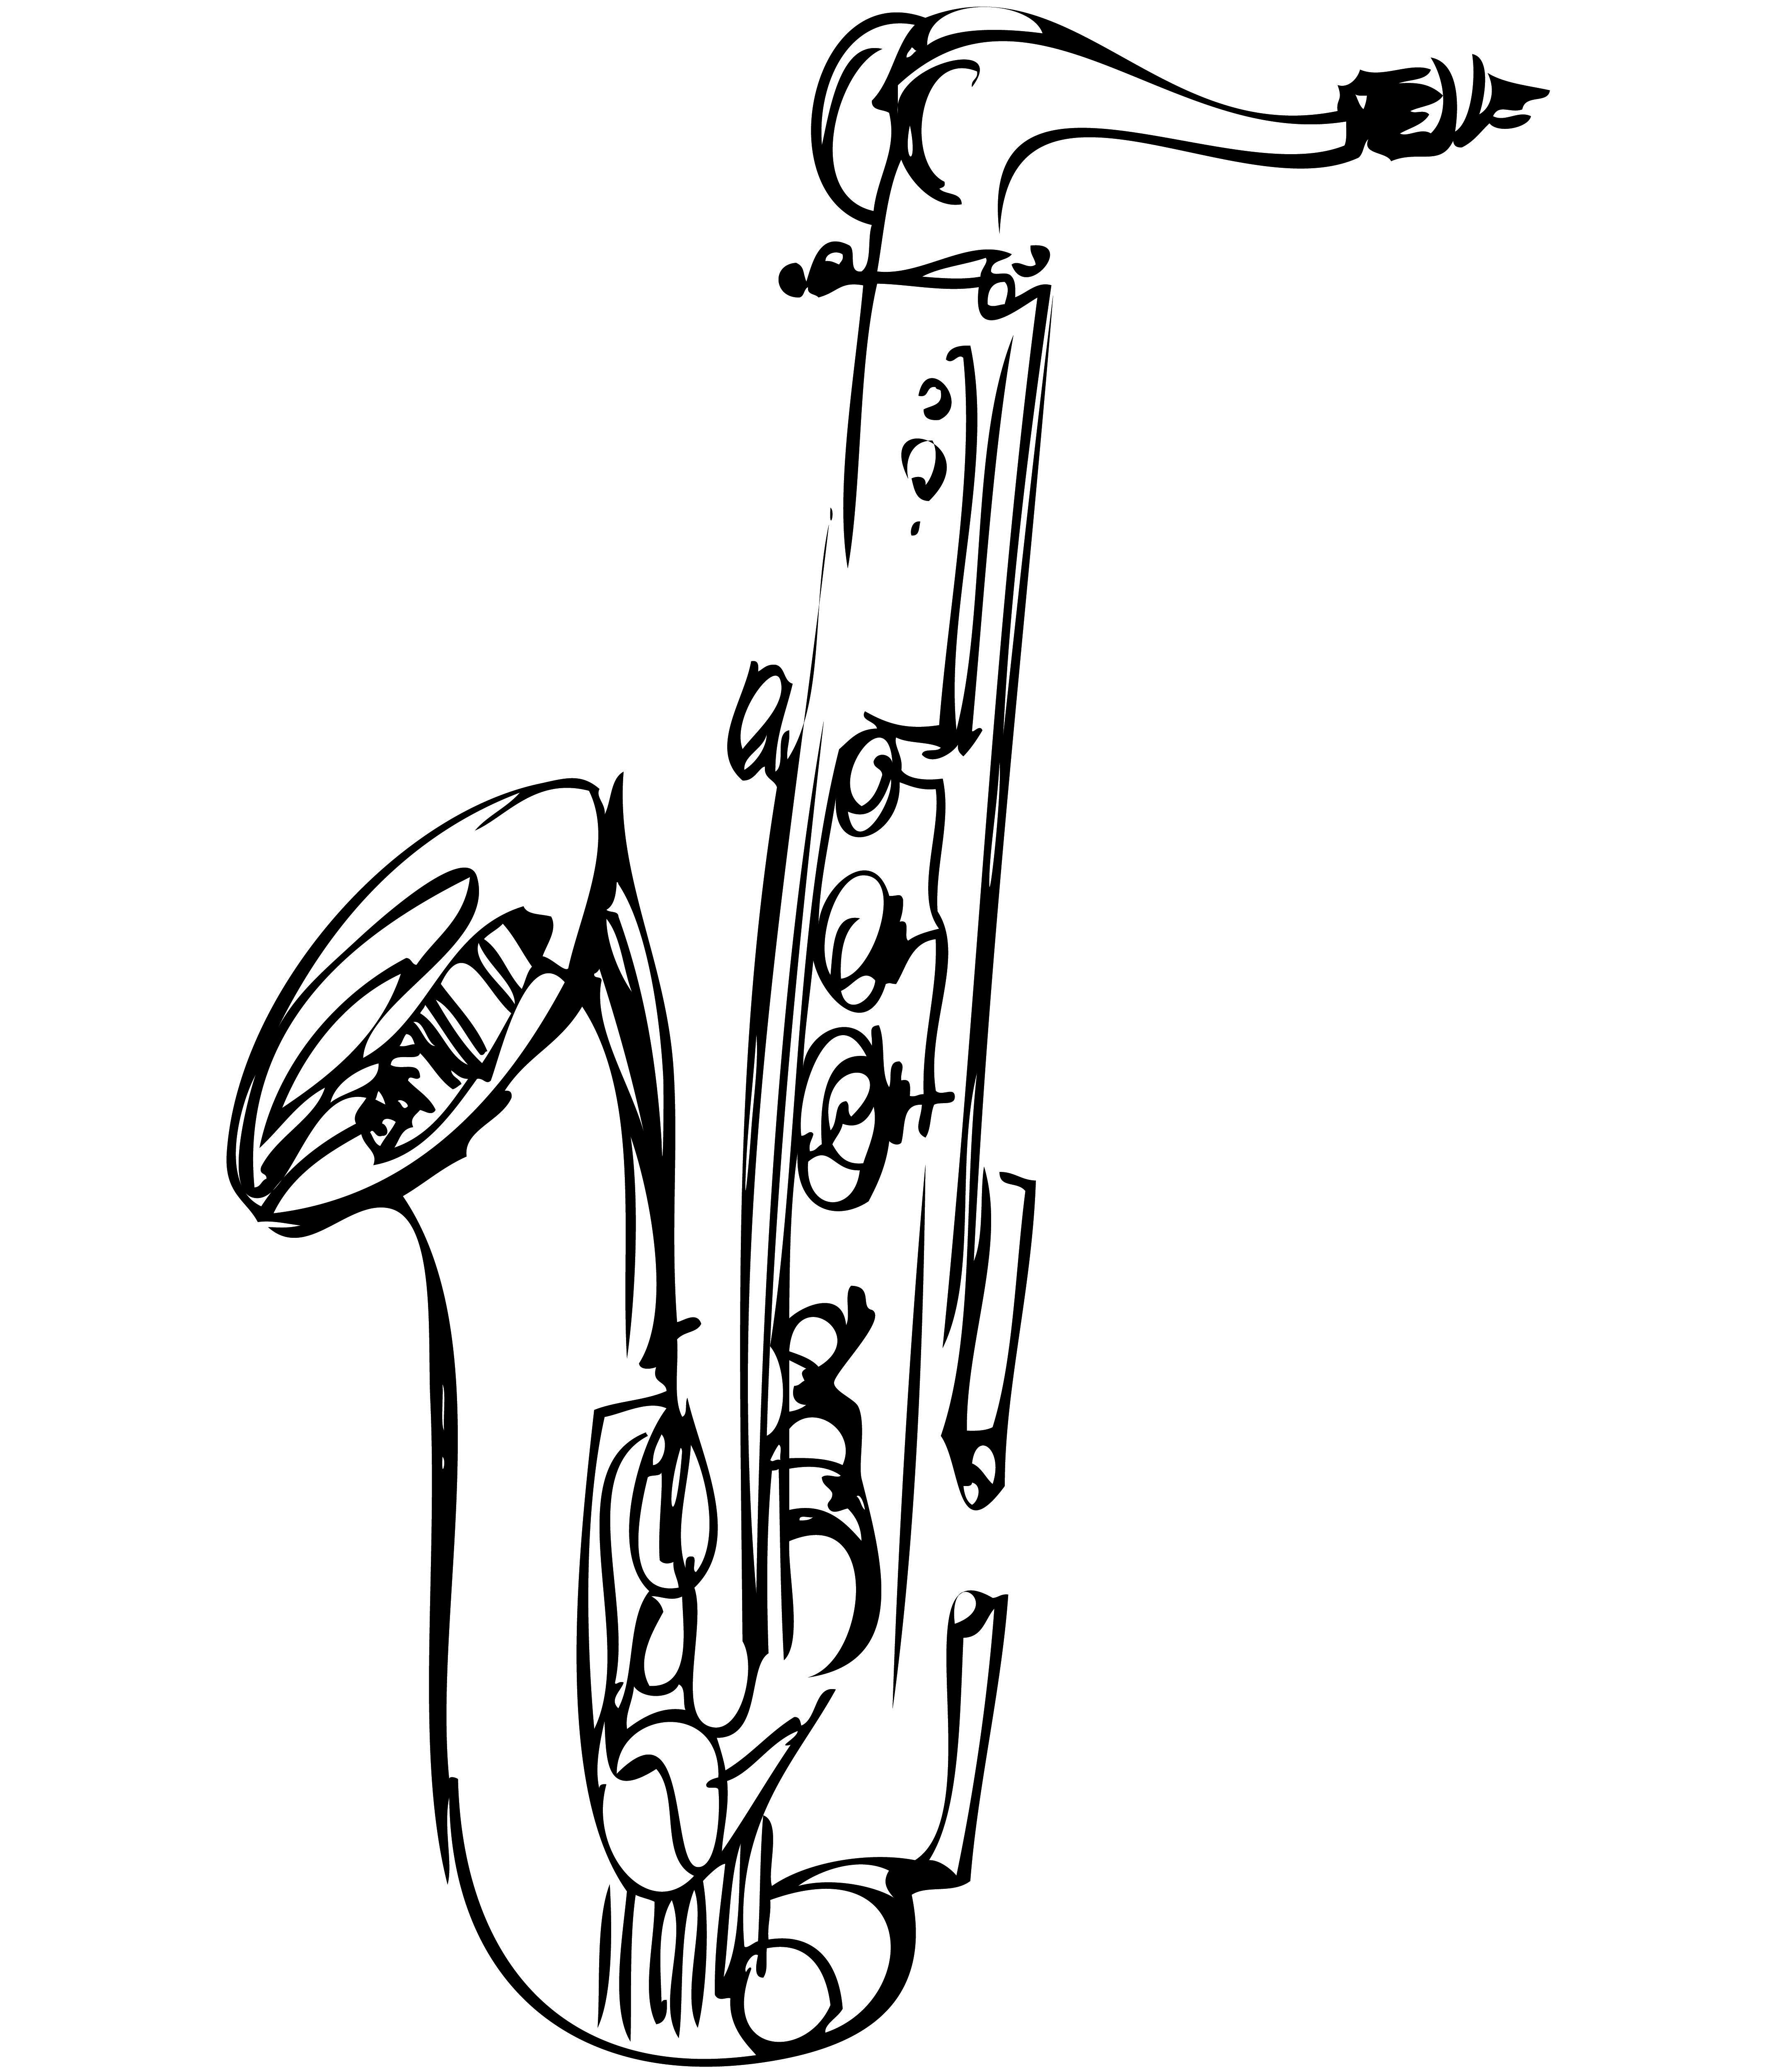 Saxophone drawing clipart best - Saxophone dessin ...